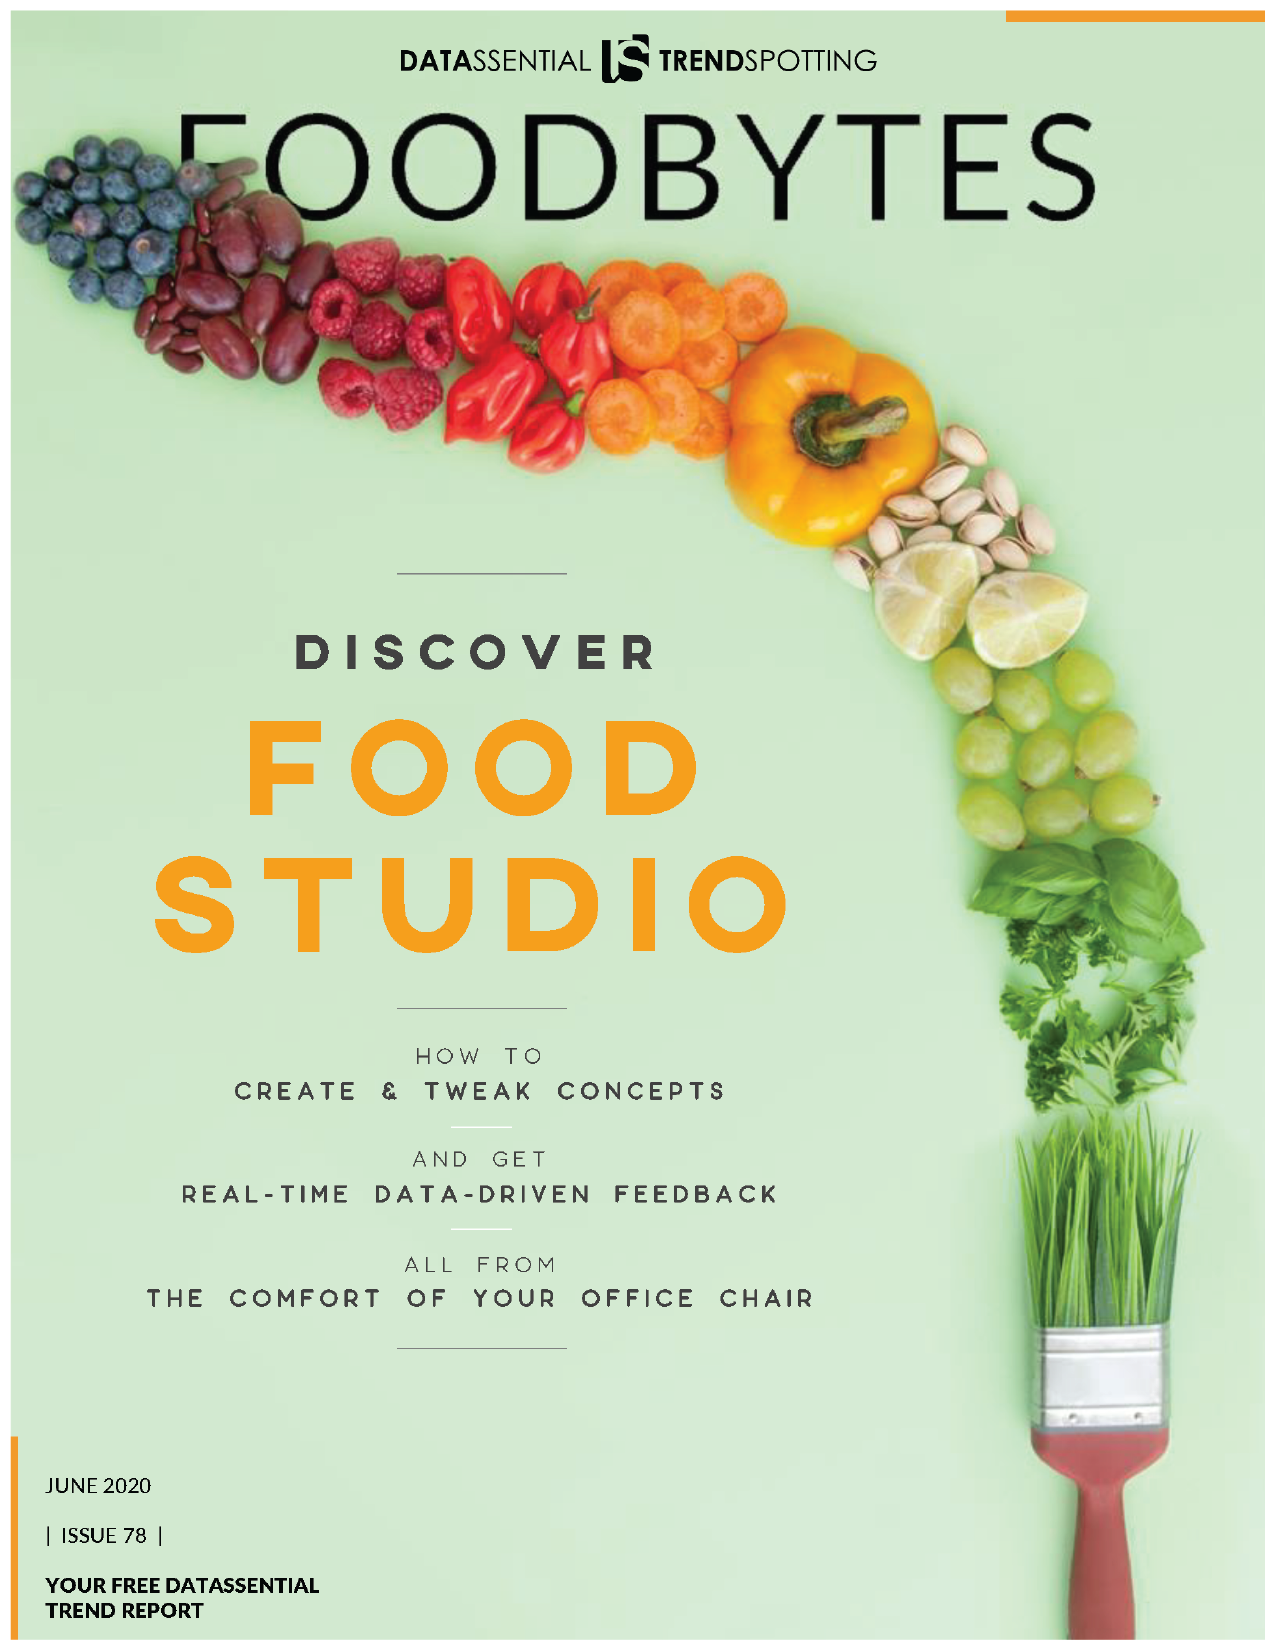 Datassential Food Studio